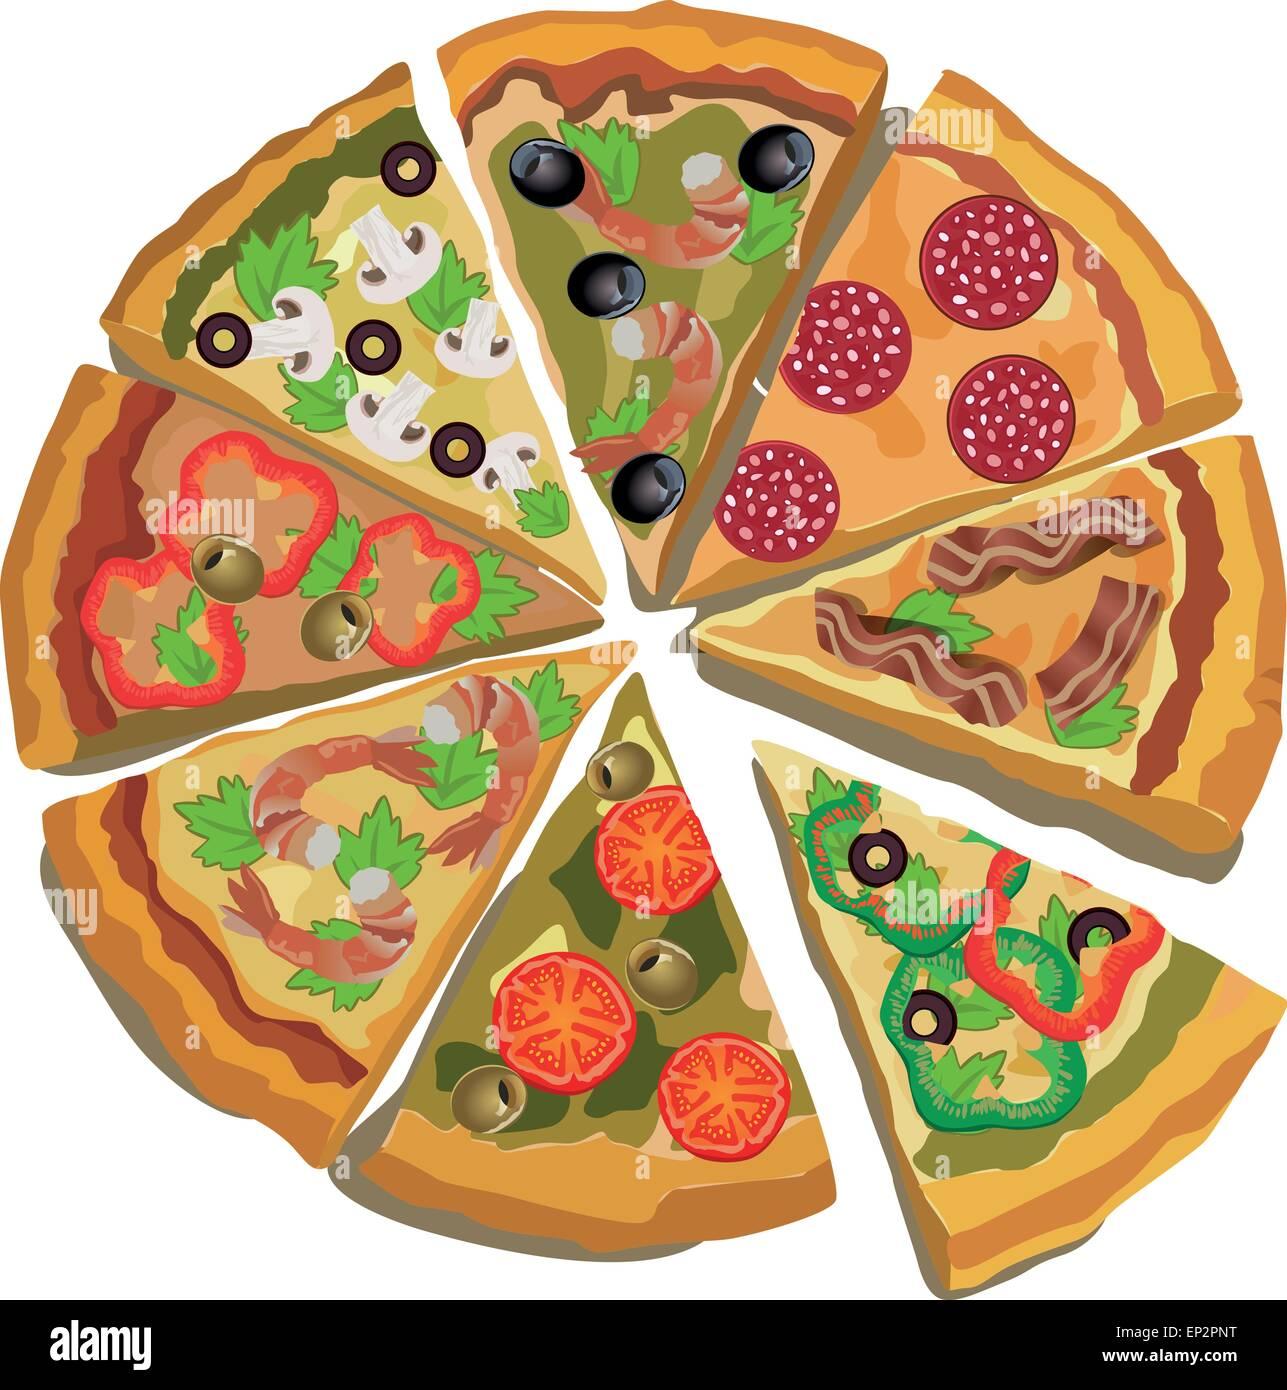 pizza shop menu template